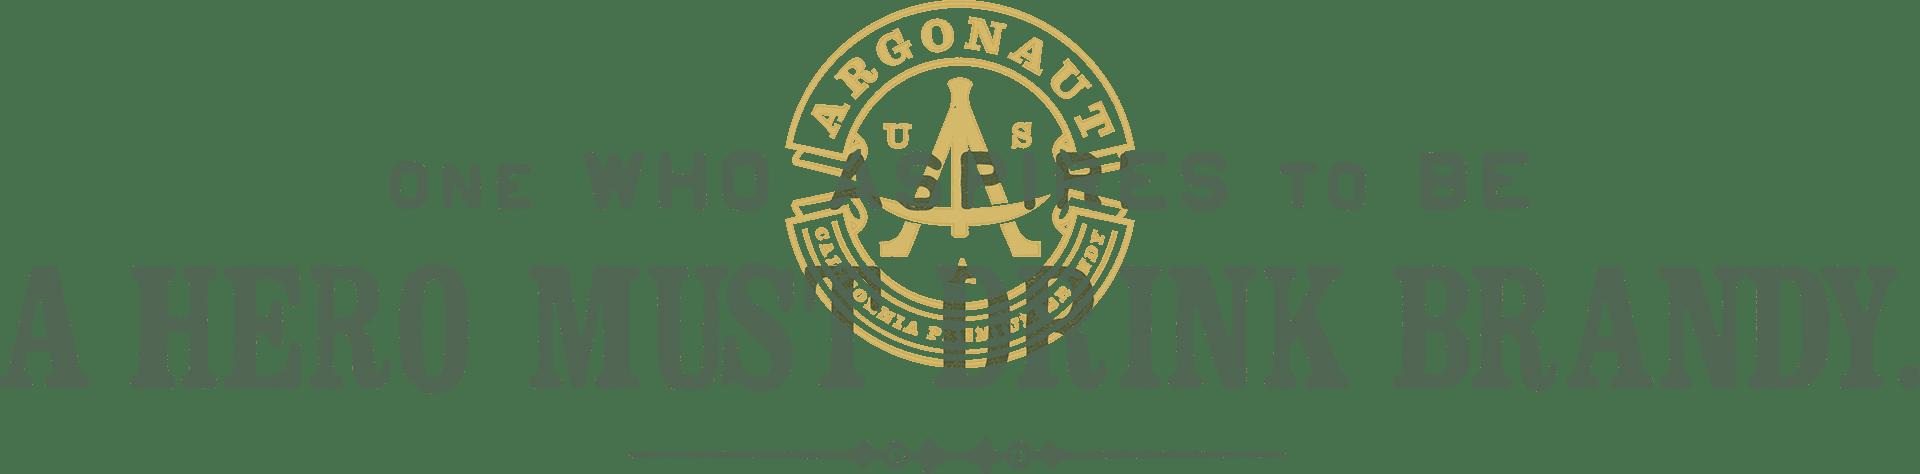 MGS_Landing_Argo-2